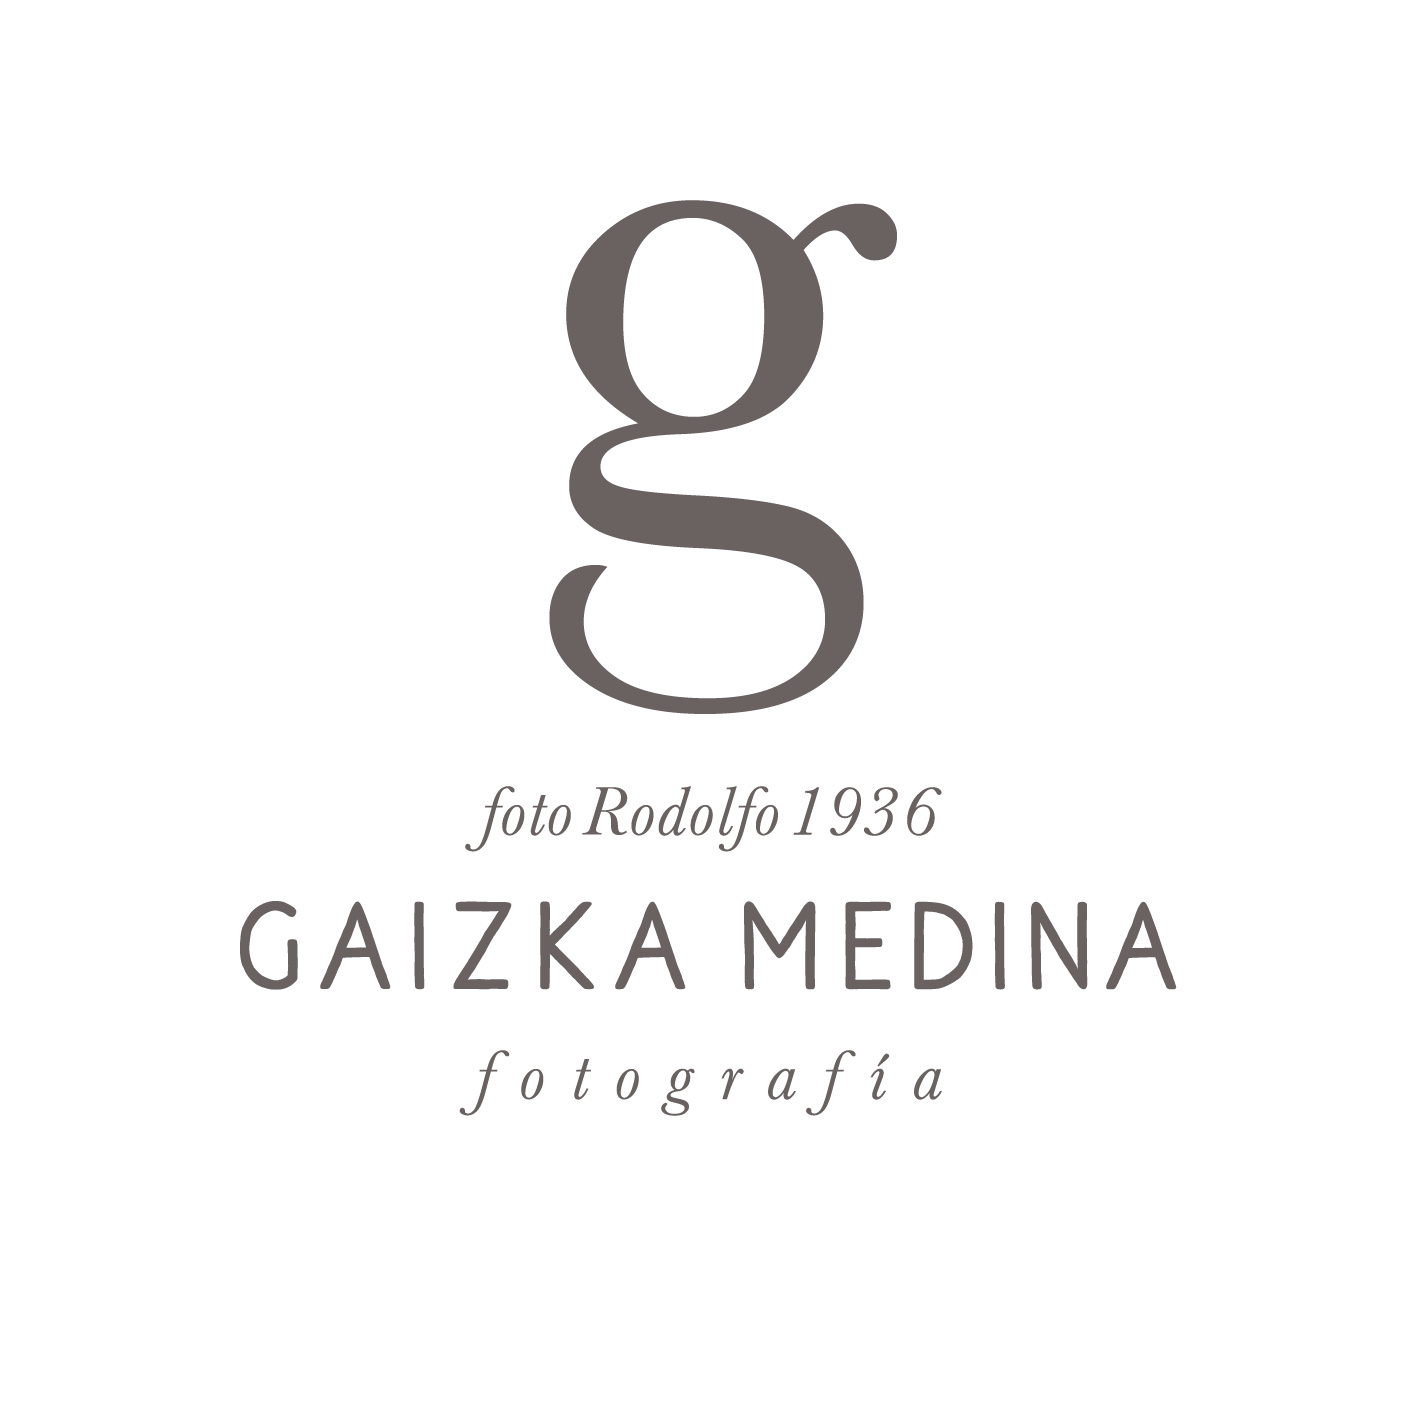 GaizkaMedina Fotografía. Foto Rodolfo 1936